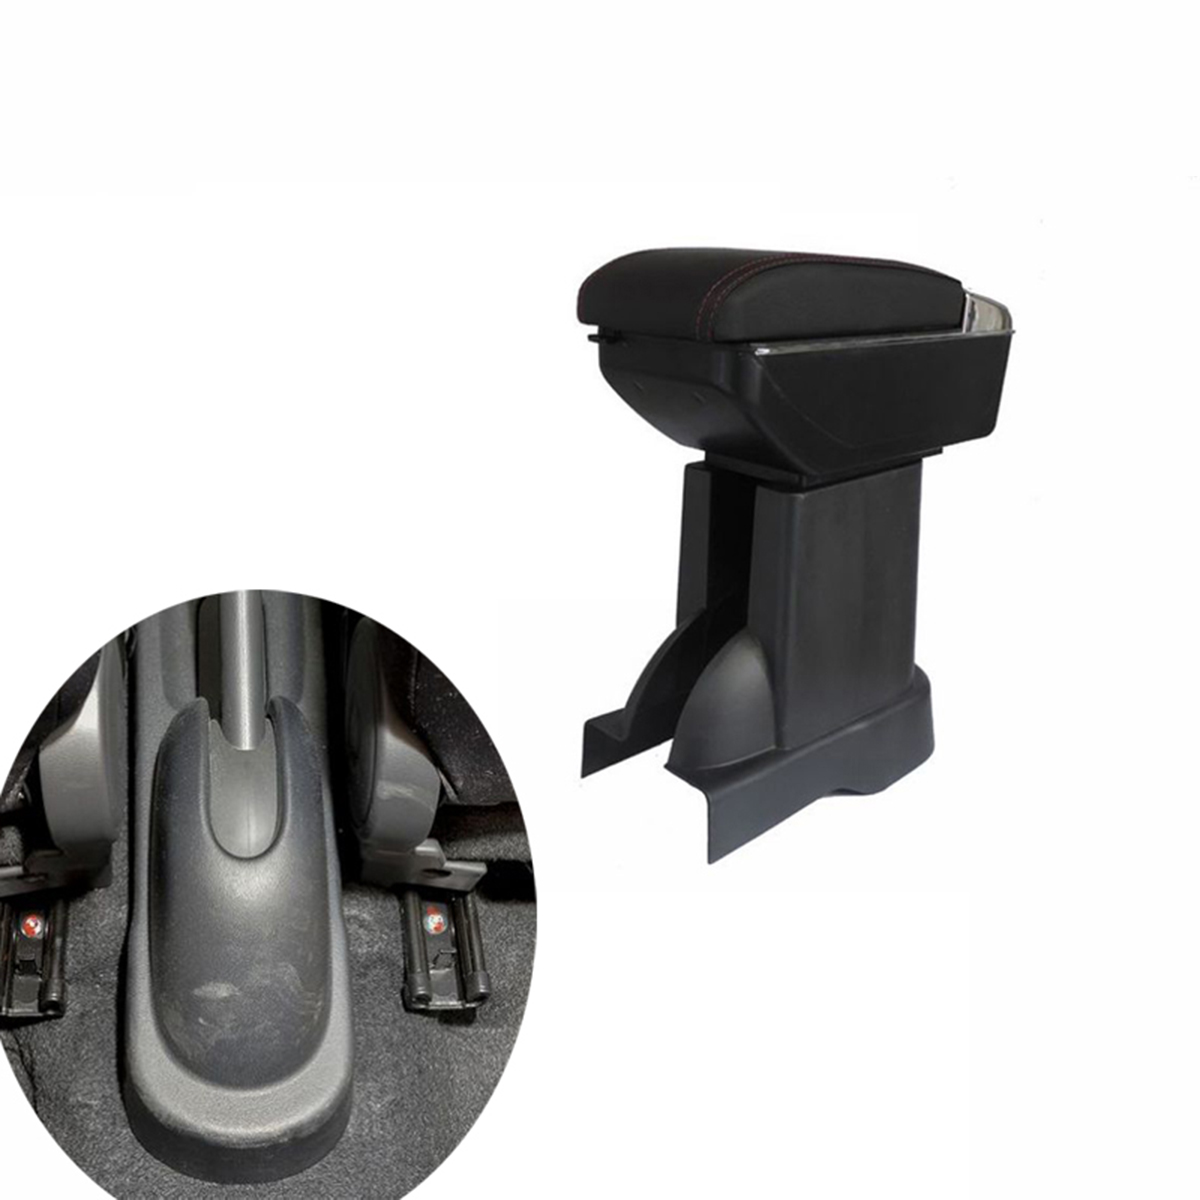 SZSS-CAR Leather Car Center Console Armrest Box for SUZUKI SX4 2008 2009 2010 2011 2012 2013 2014 2015 2016 2017 Armrests Storage Box Grey Color